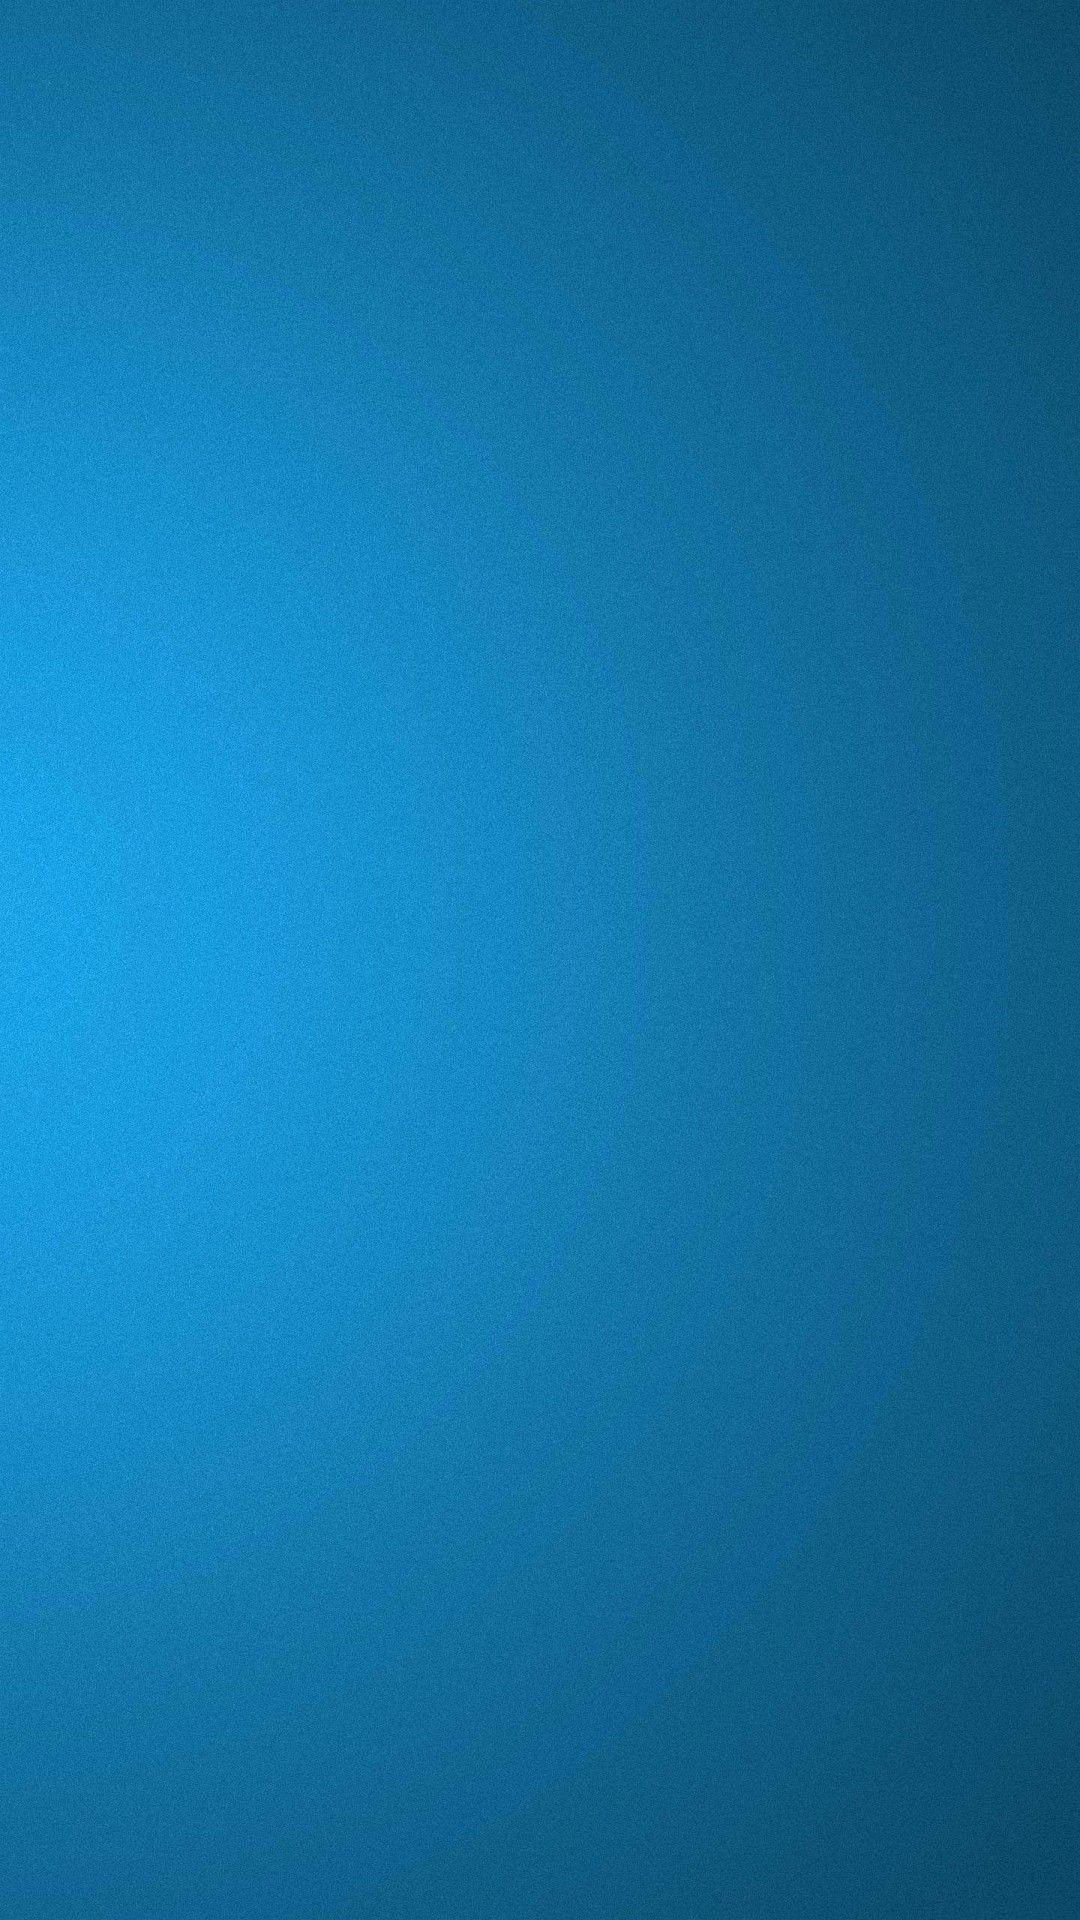 Plain Blue Wallpapers - Wallpaper Cave